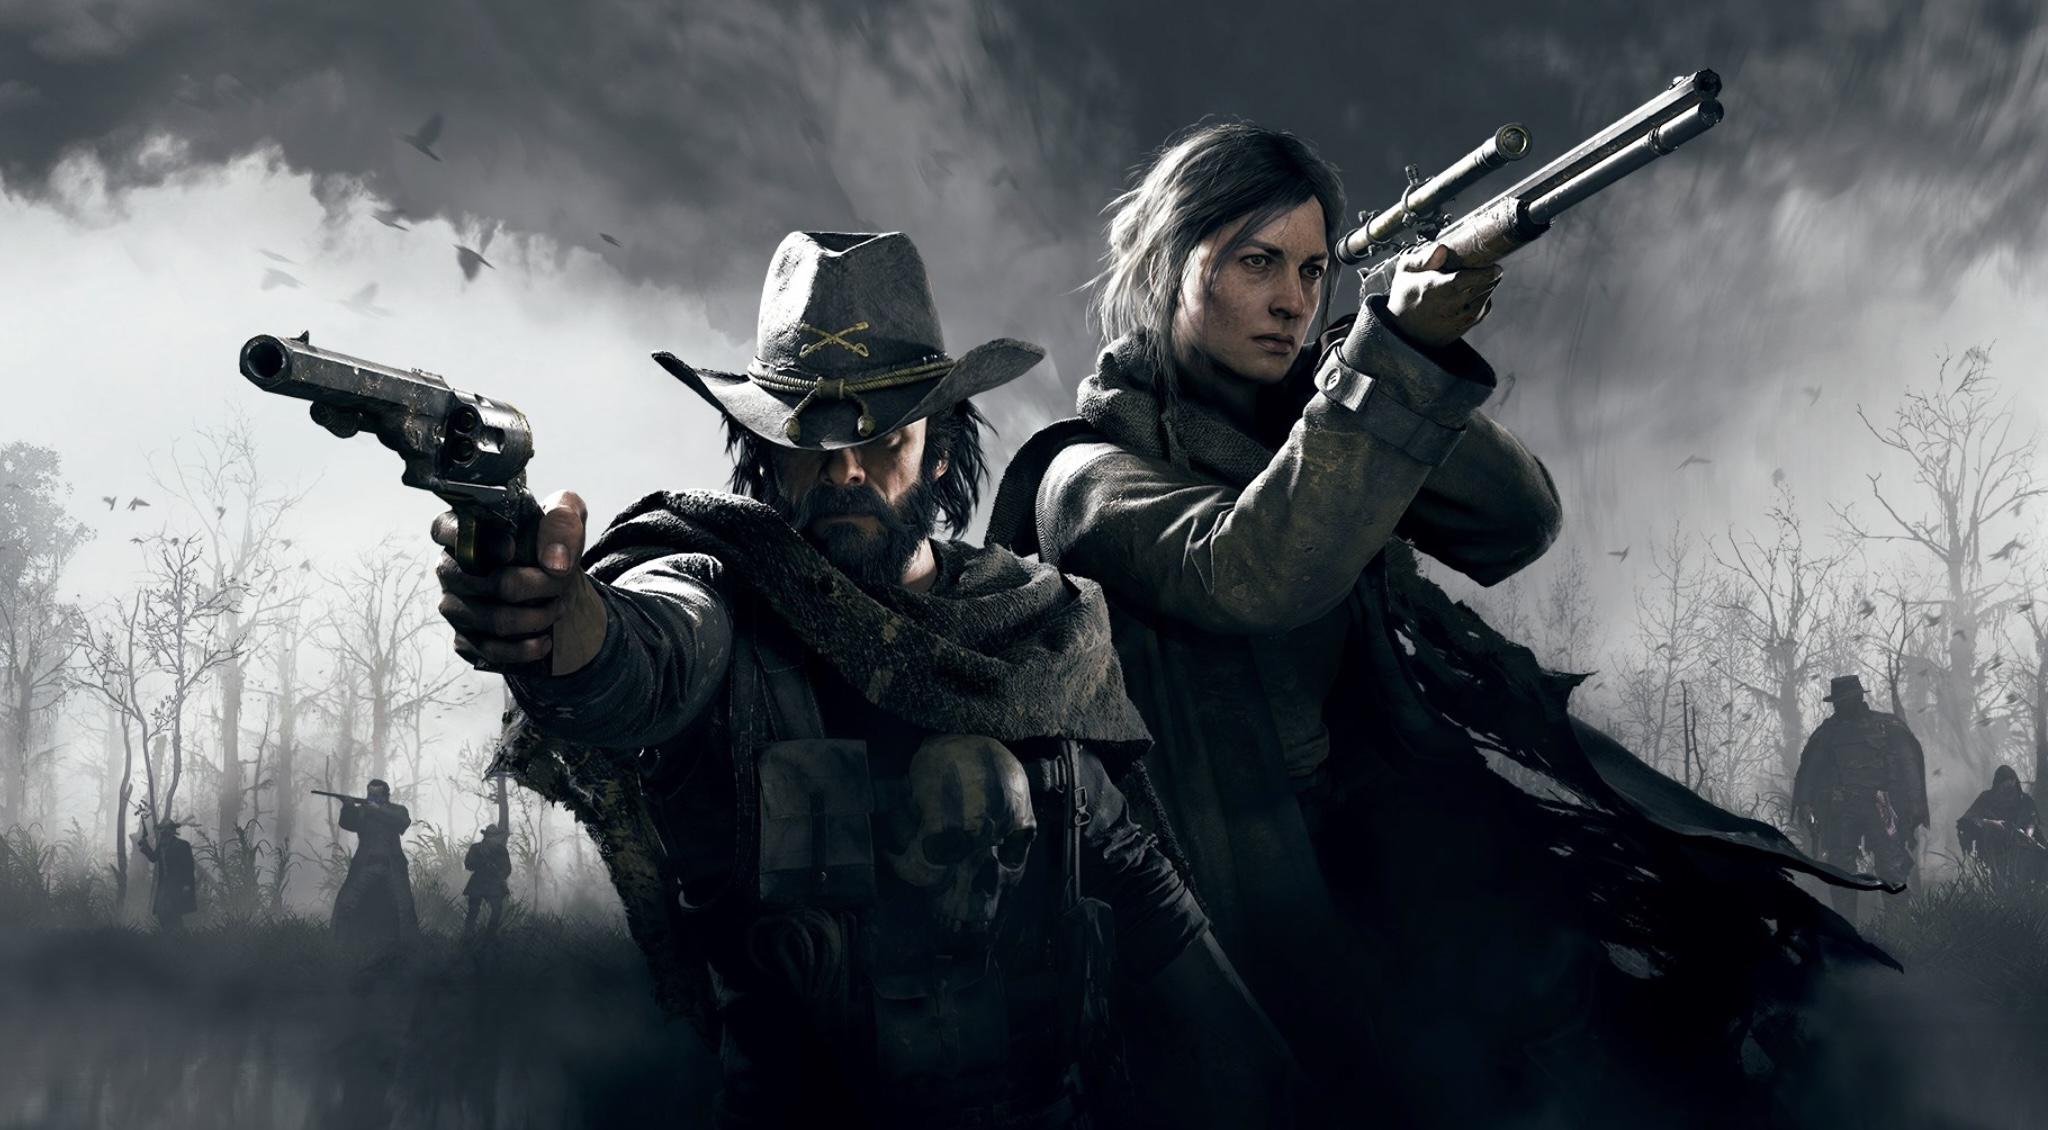 Hunt Showdown Update 1.25 Patch Notes